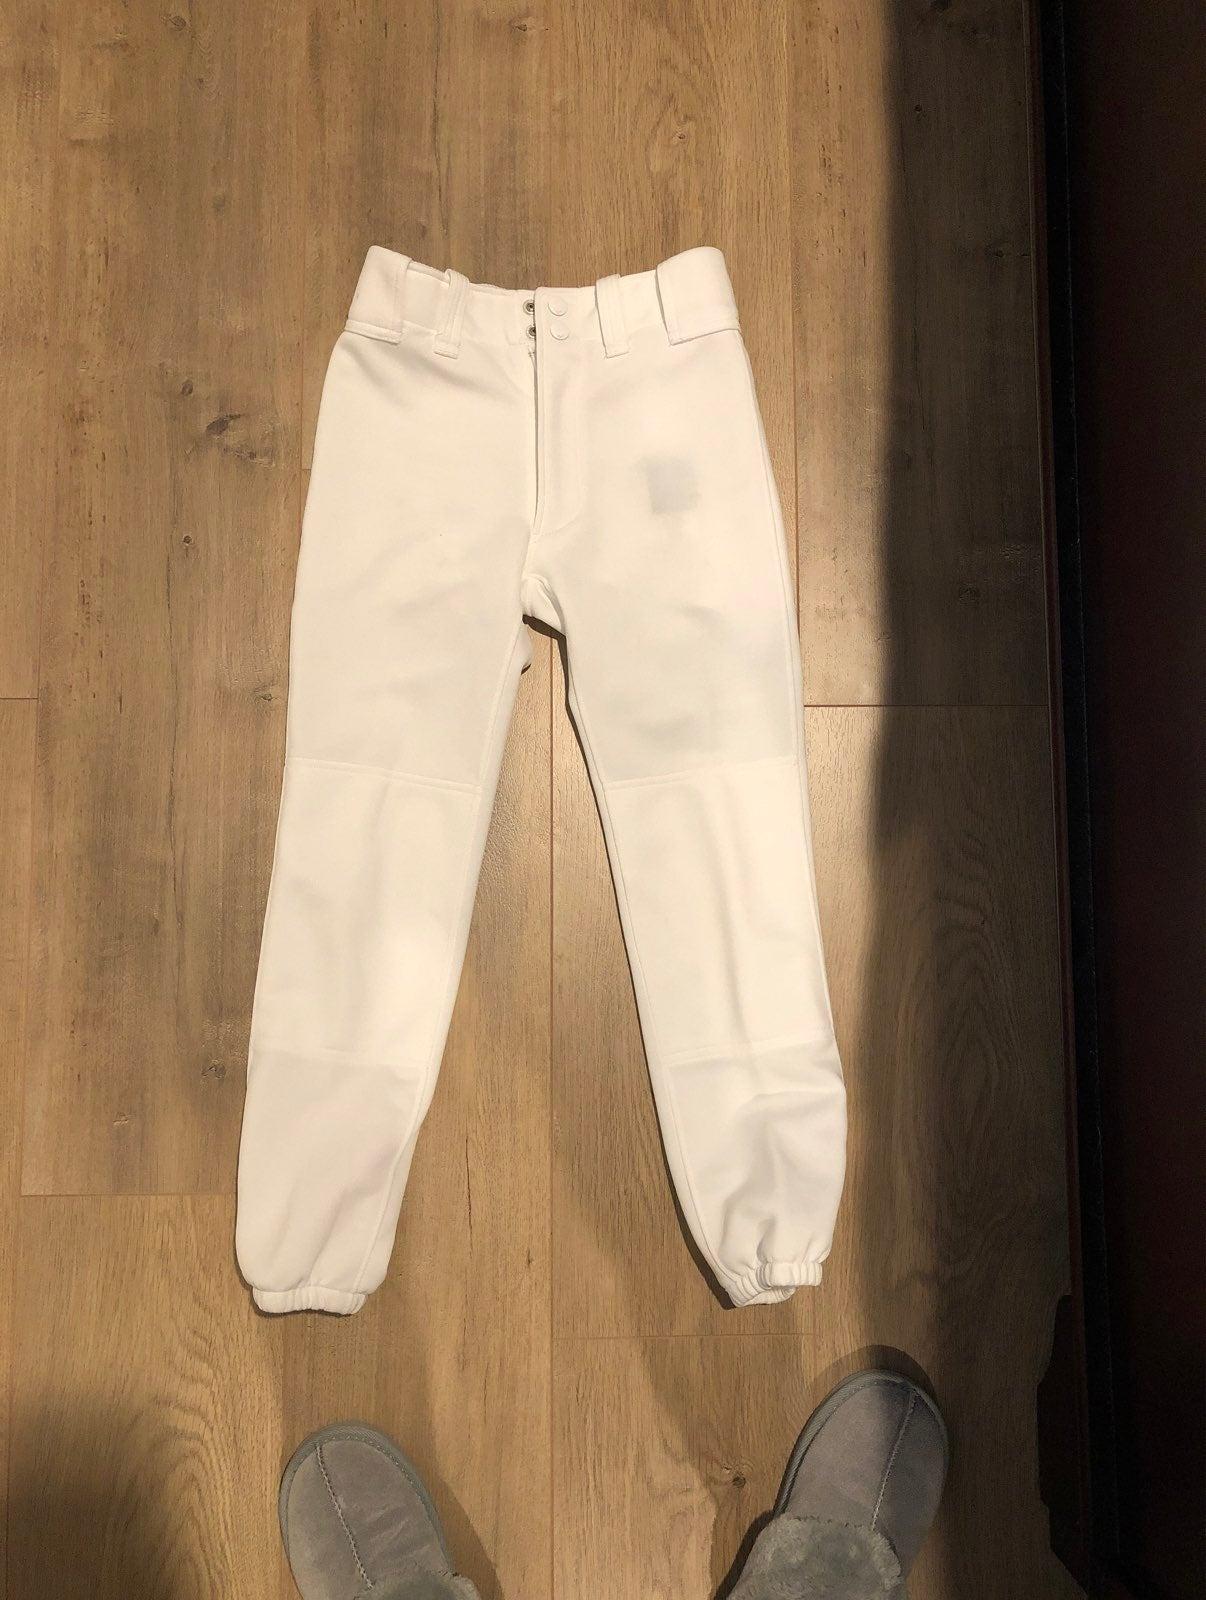 Boys white baseball pants - Y Medium